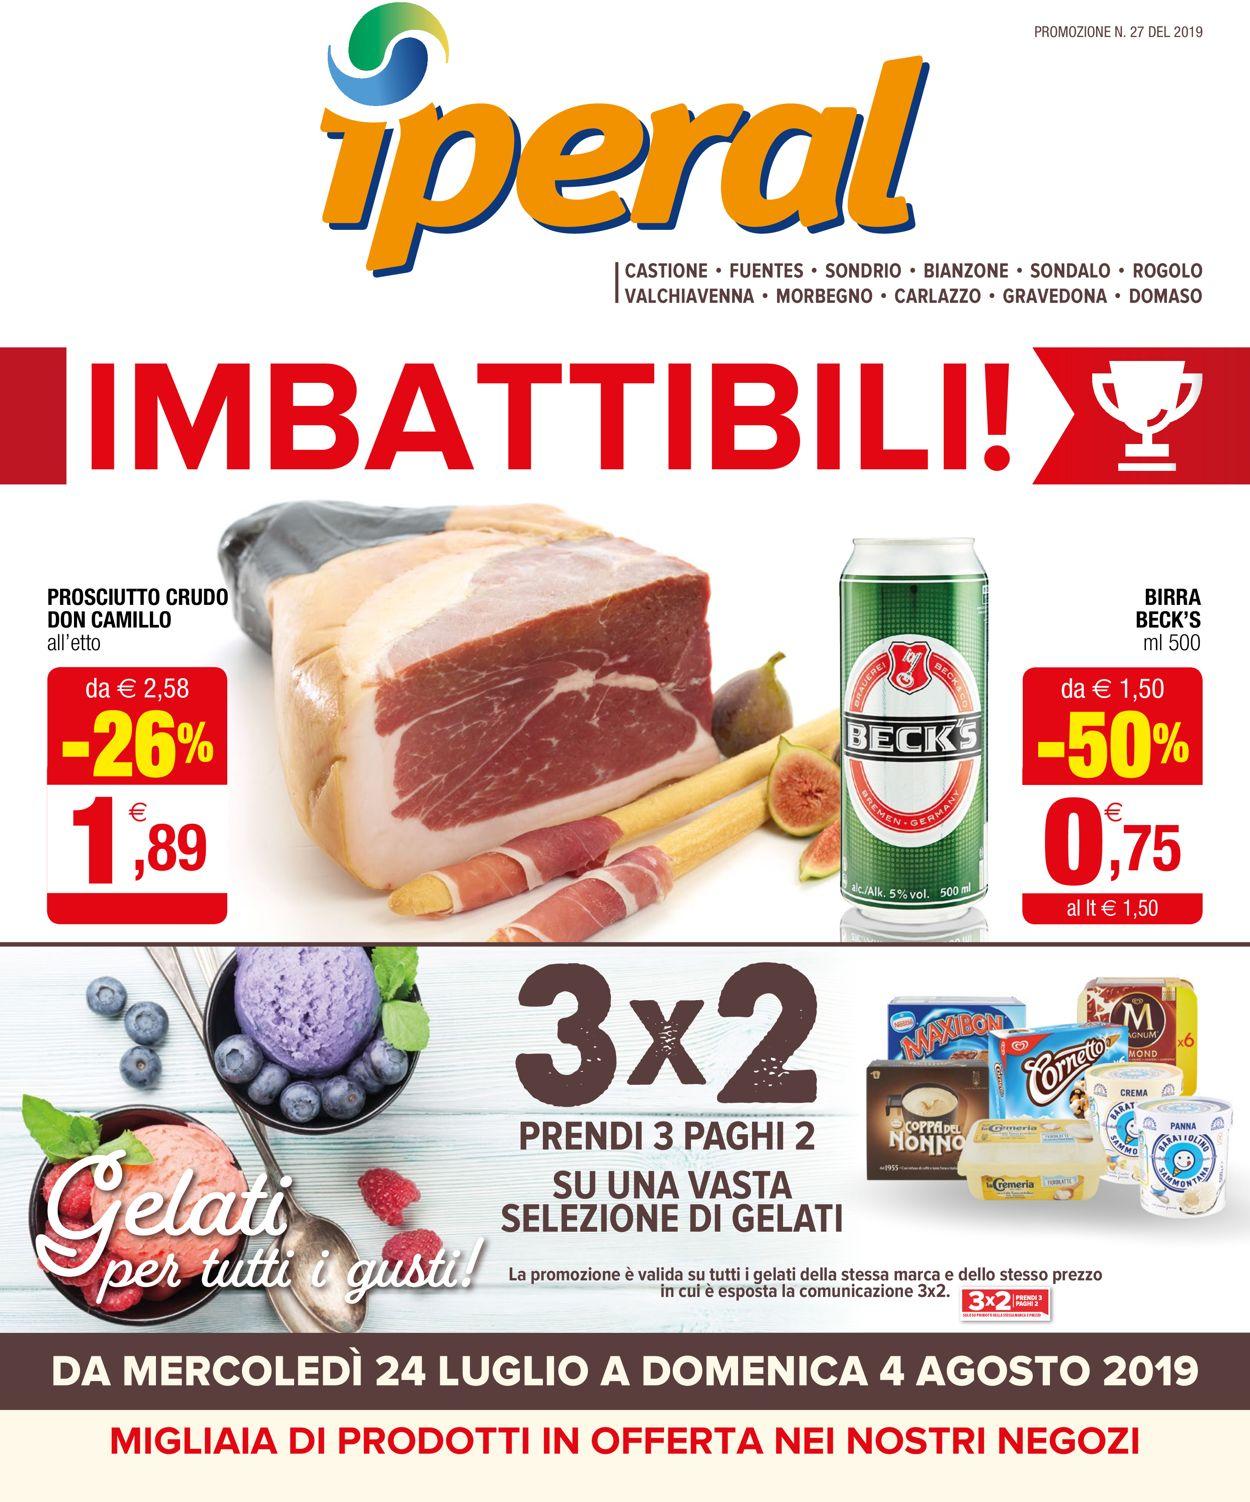 Volantino Iperal - Offerte 24/07-04/08/2019